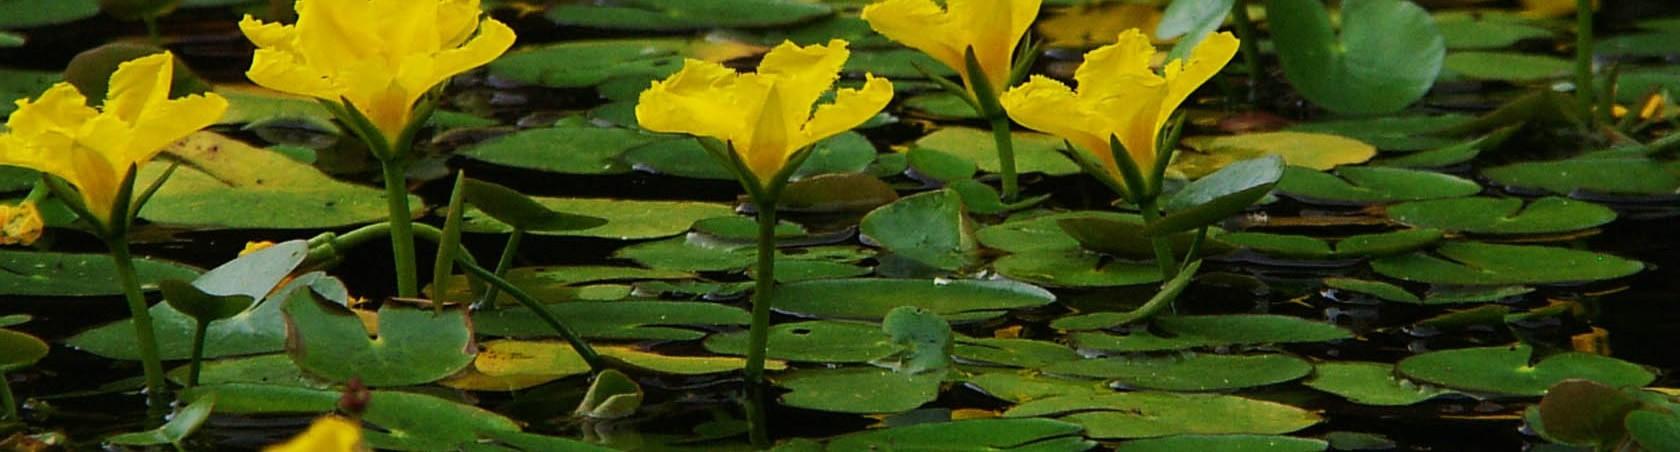 water-gardens